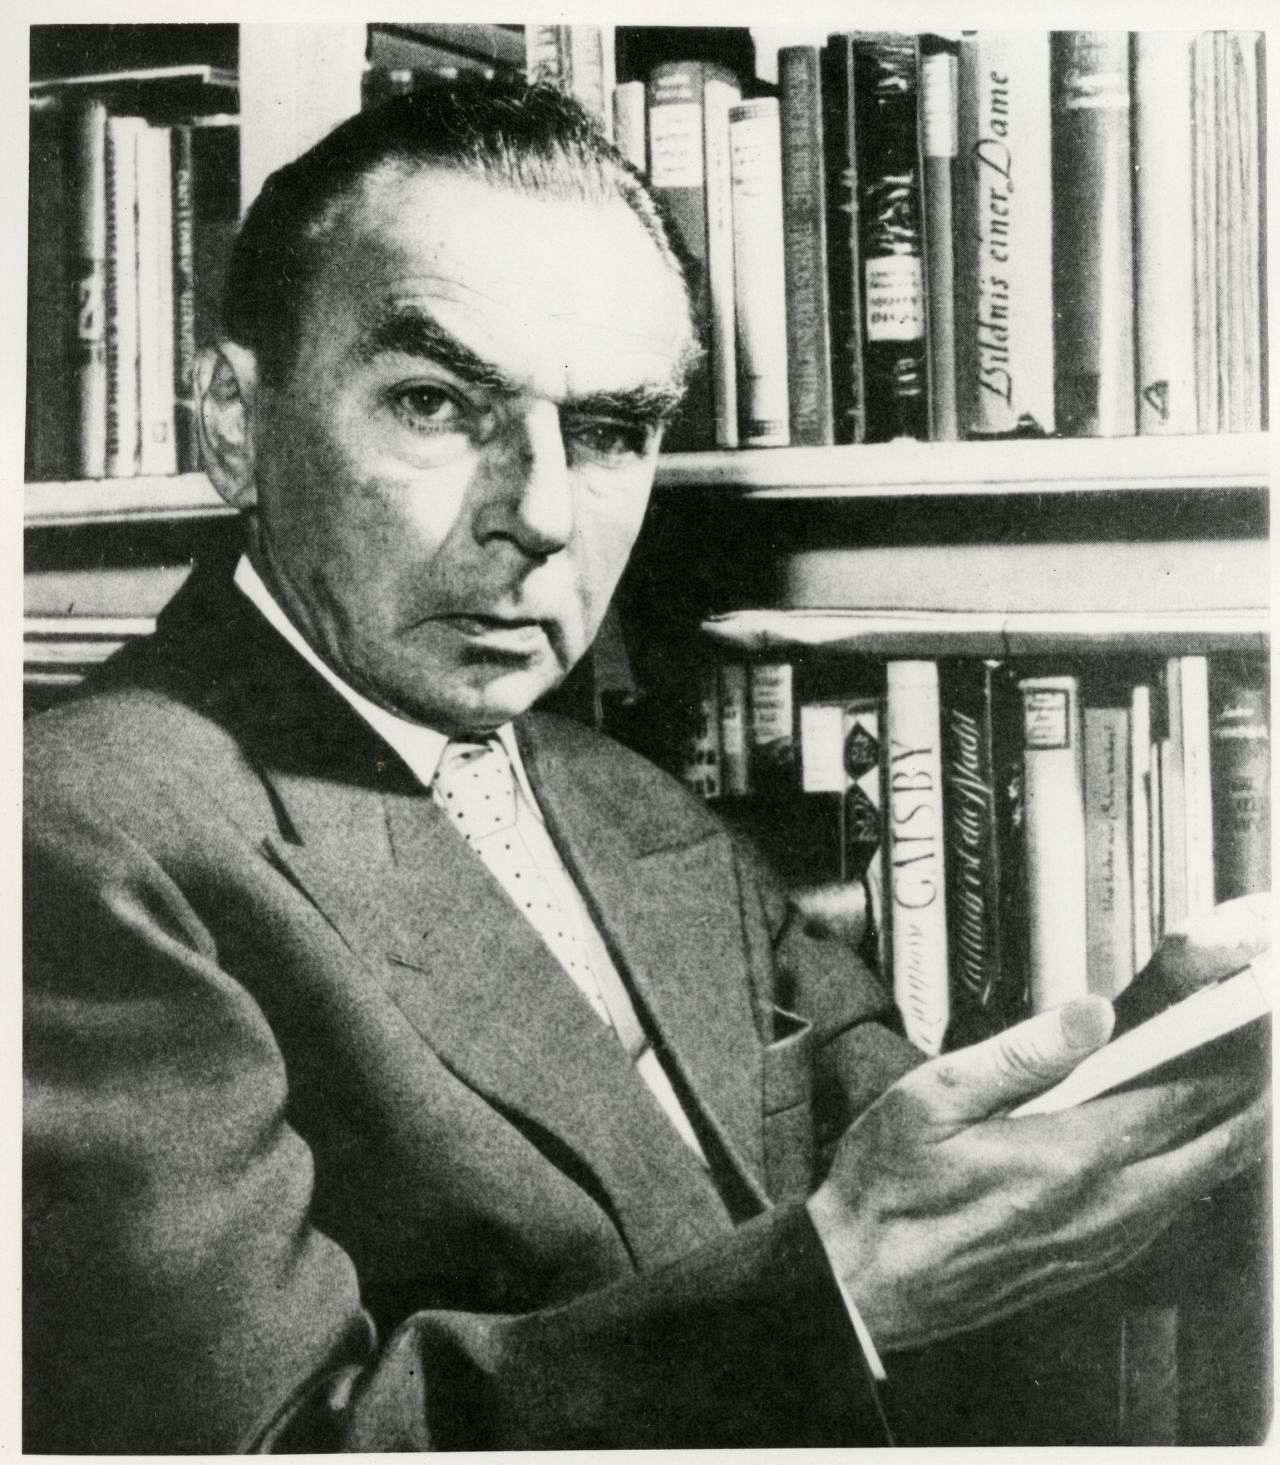 Porträtfotografie des bekannten Schriftstellers Erich Kästner, ...